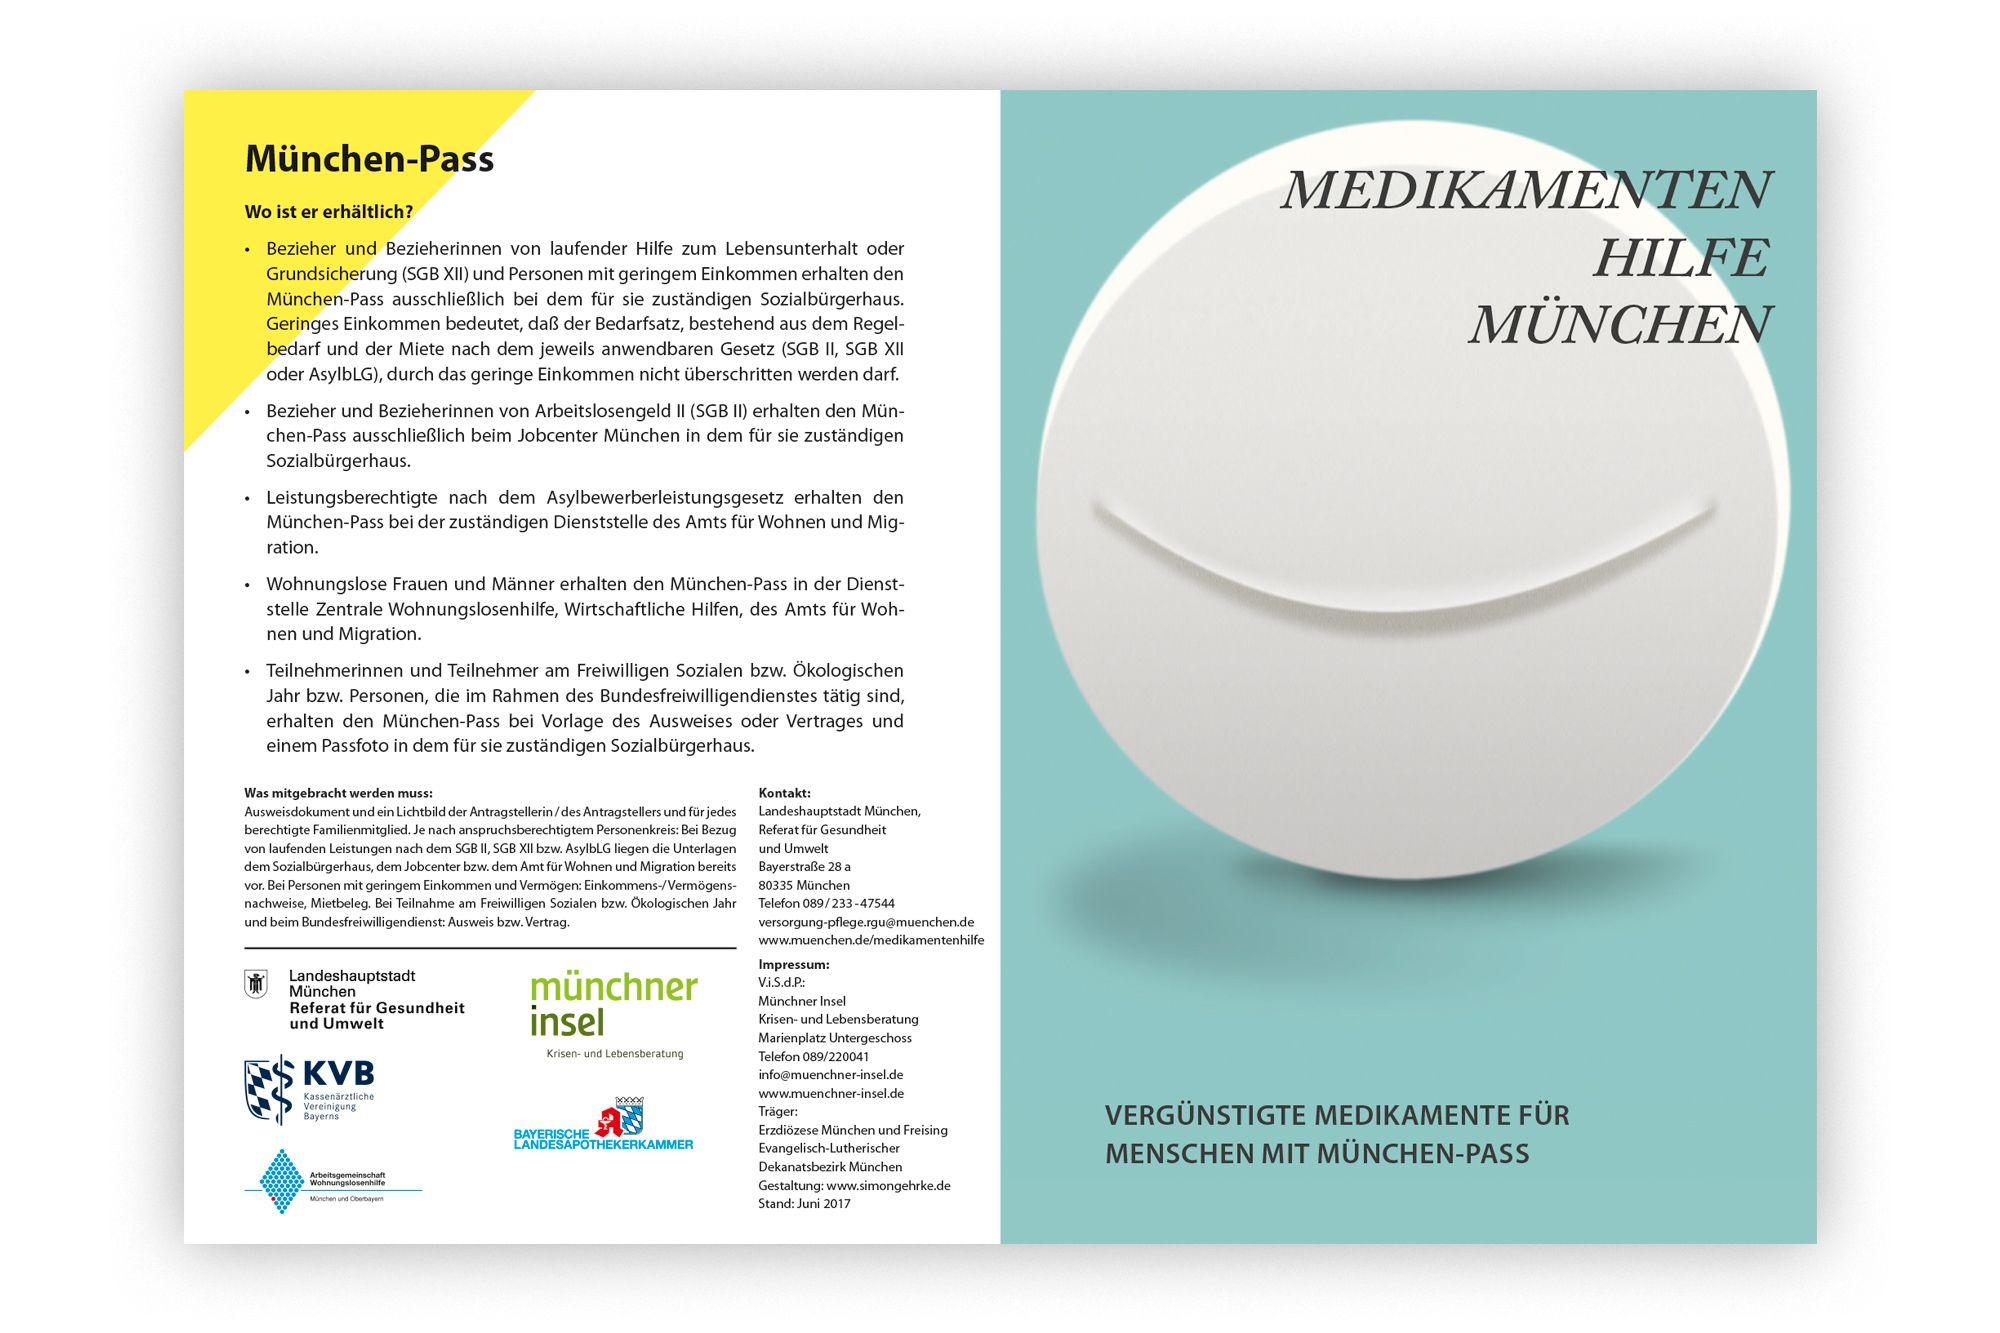 Medi Flyer 2017 Ly01 1